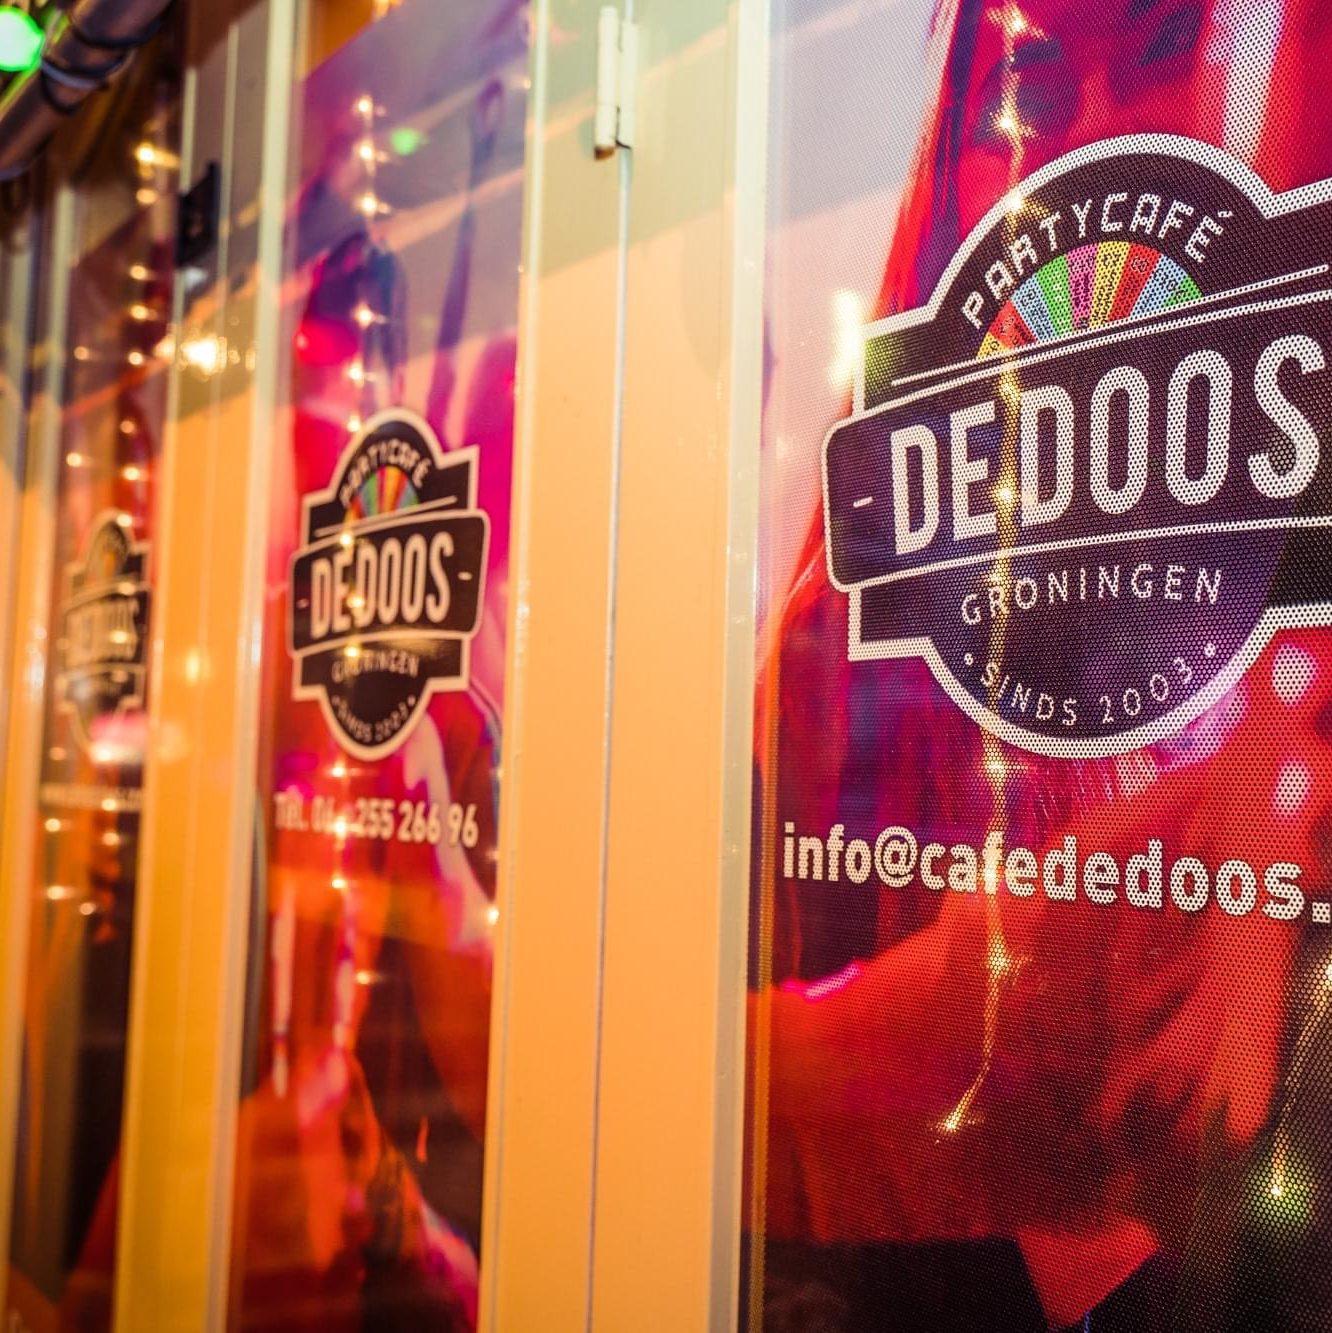 Café de Doos - Contact